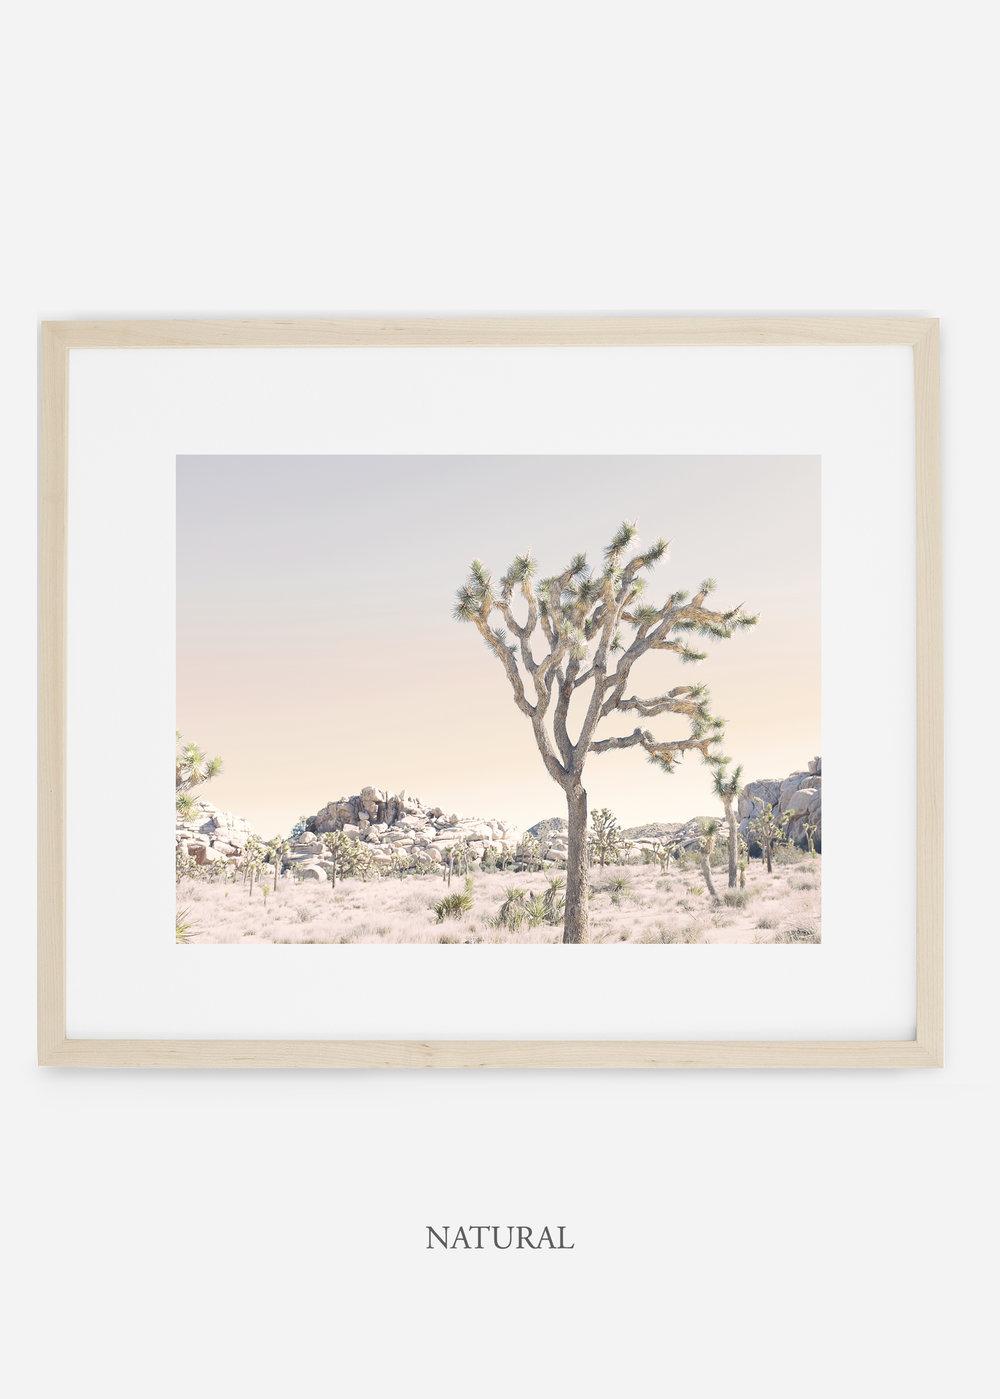 WilderCalifornia_naturalframe_JoshuaTree_No.3_interiordesign_prints_art.jpg